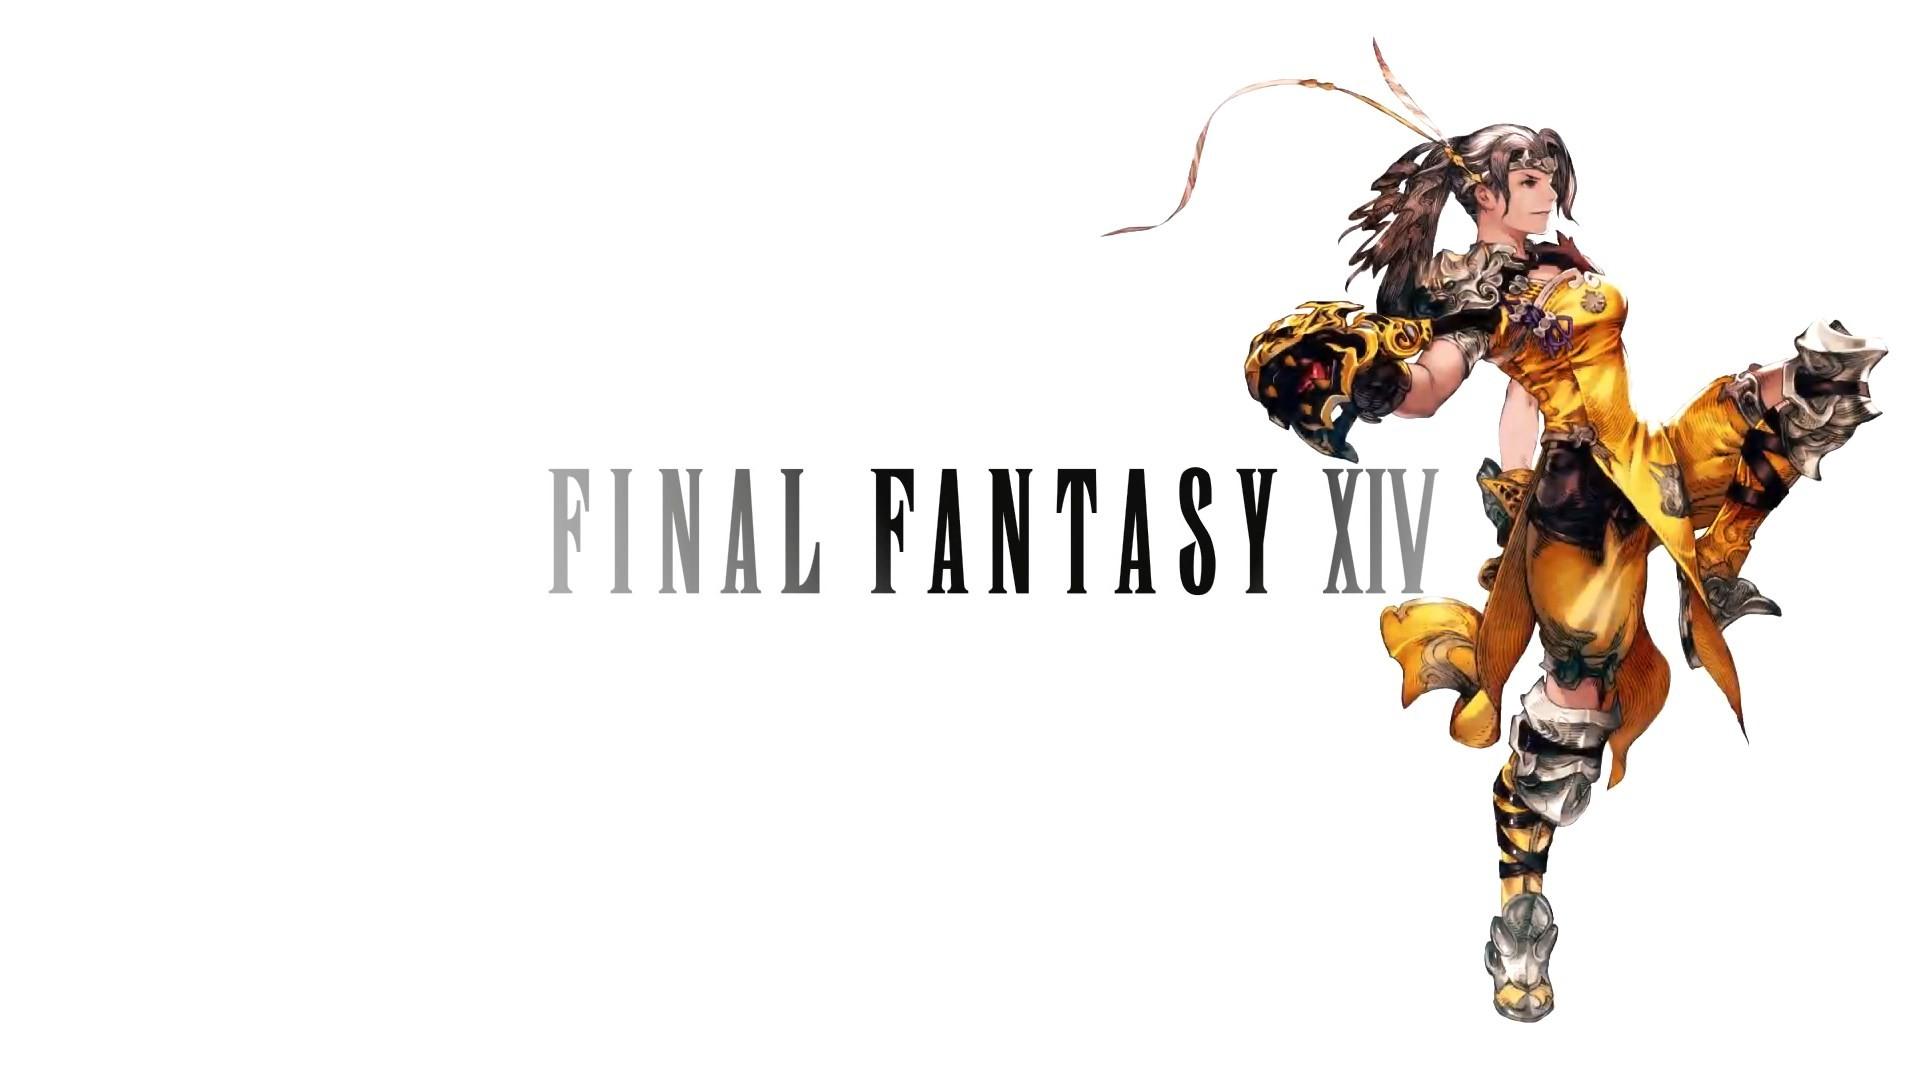 2017-03-04 – final fantasy xiv wallpaper for desktop hd, #1976620